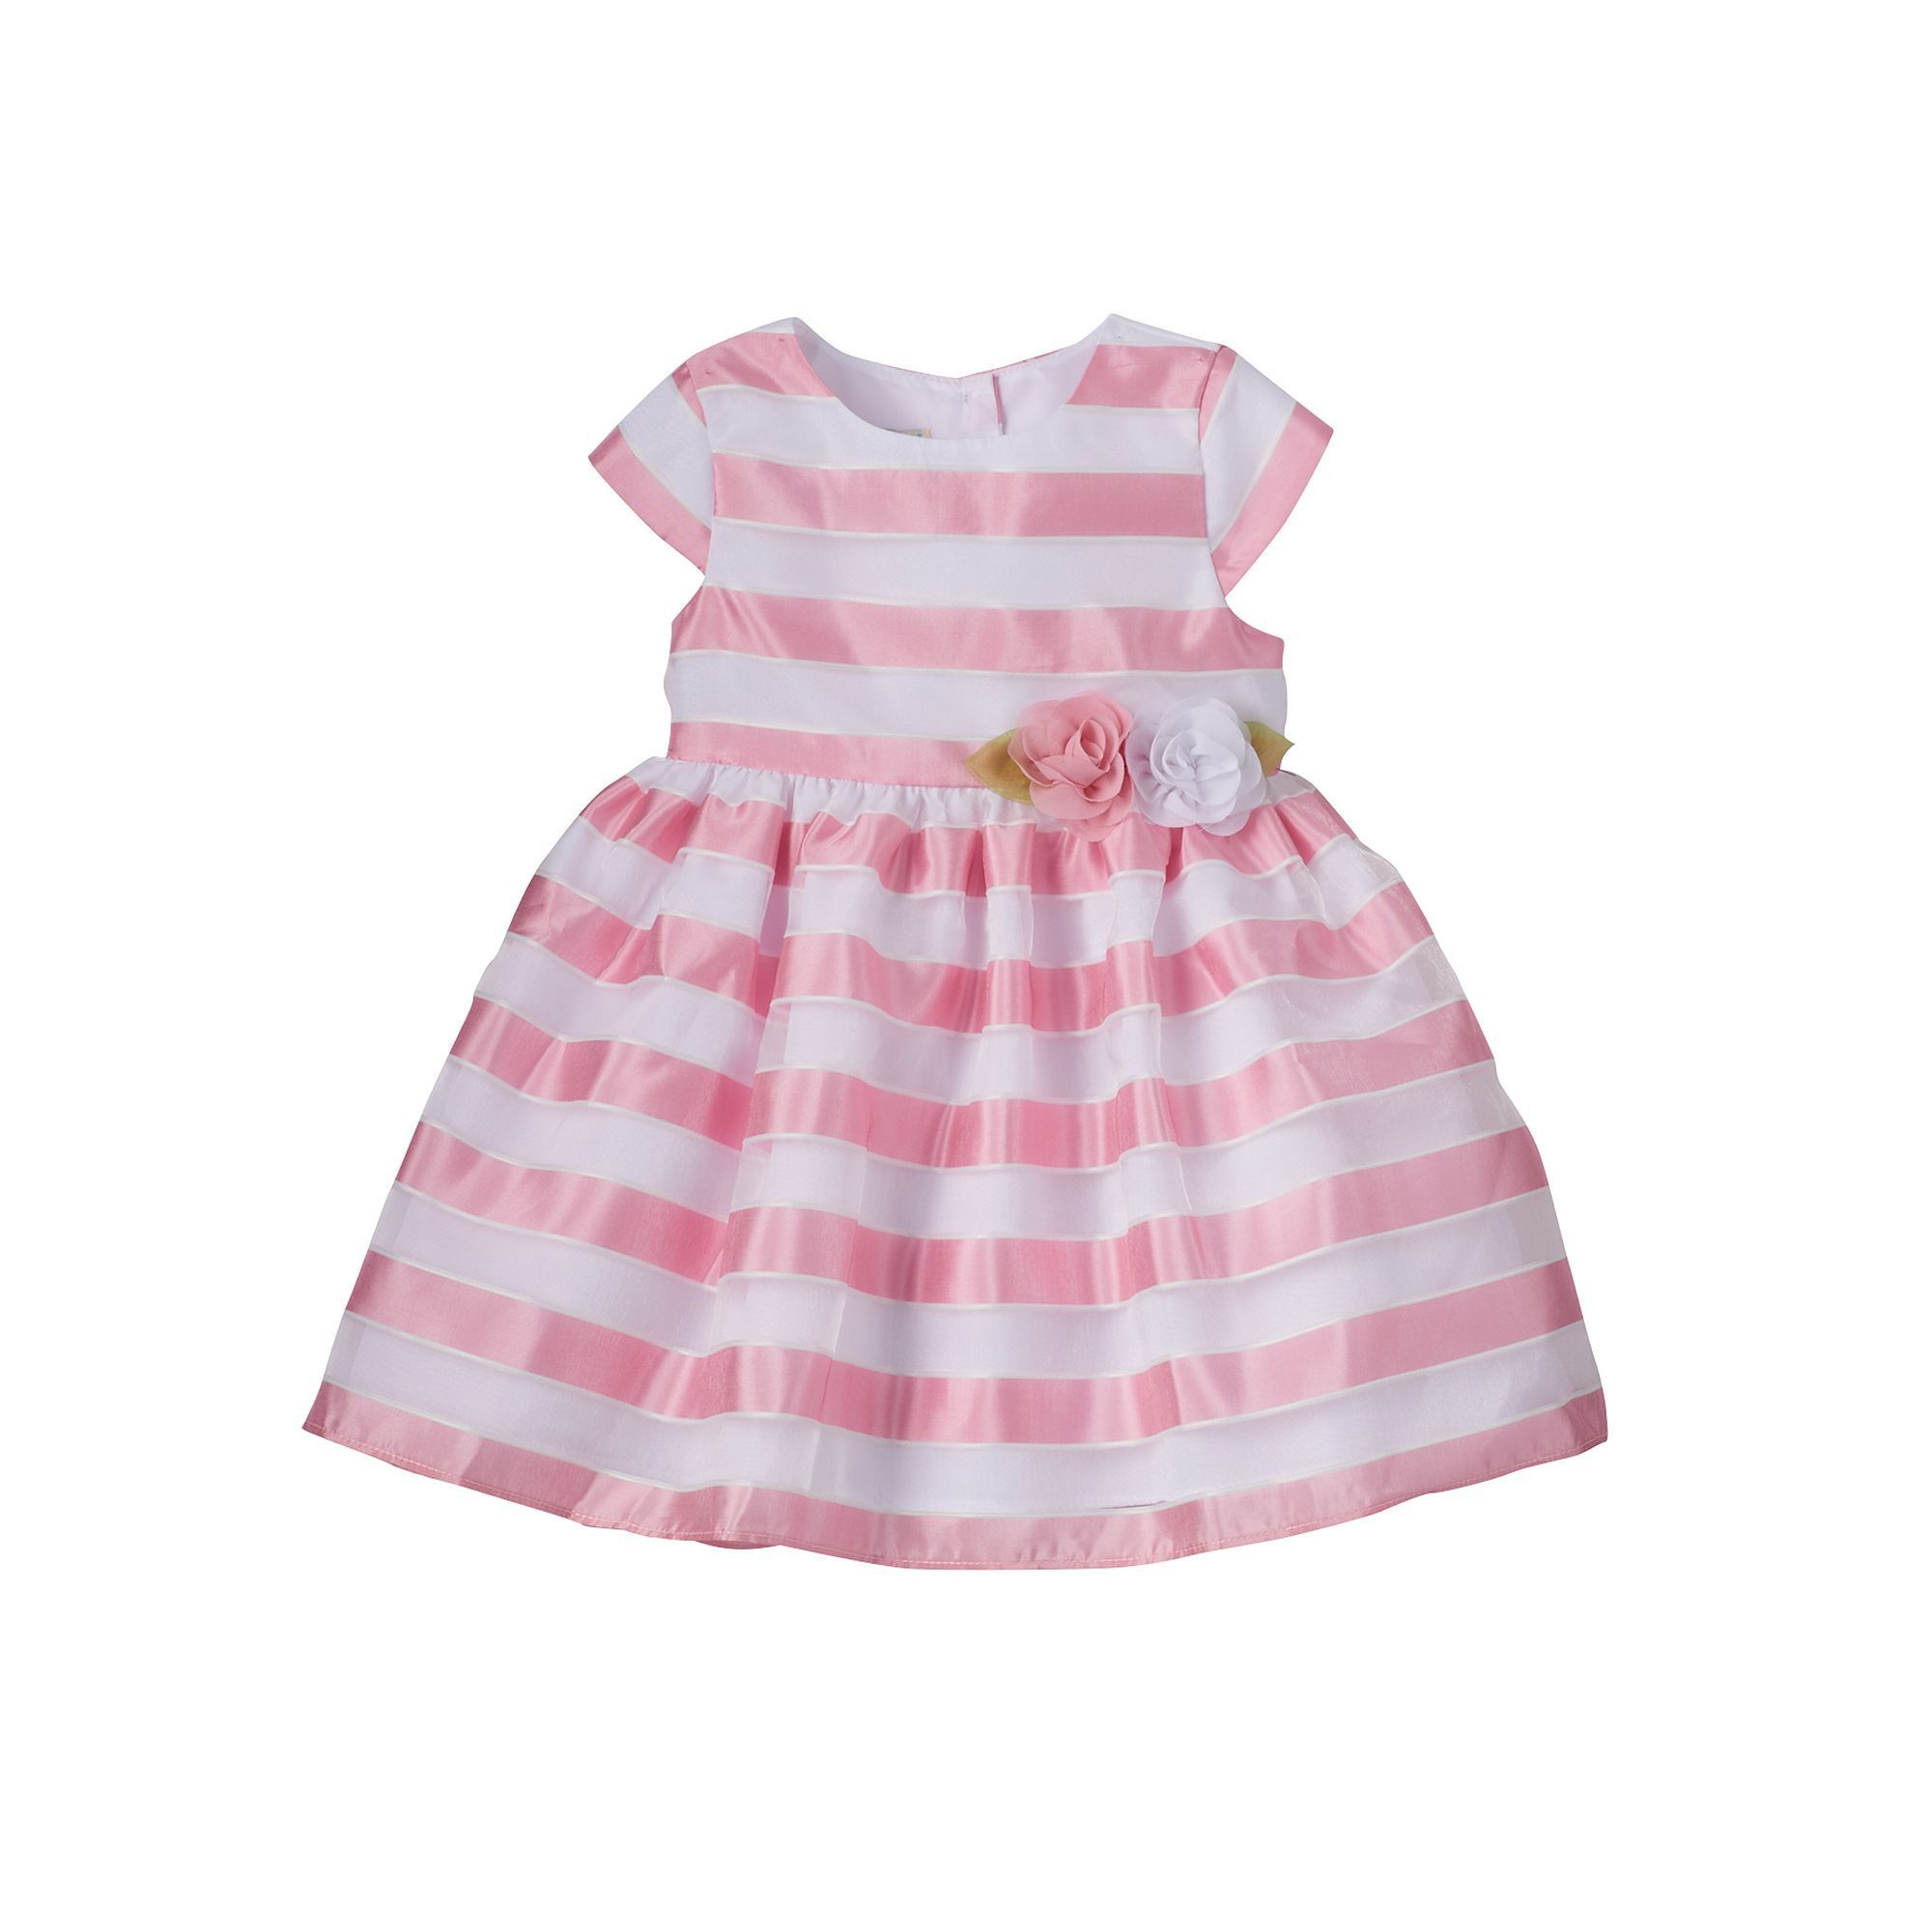 Toddler Girl Marmellata Classics Sheer Stripe Dress Size 2T Dark